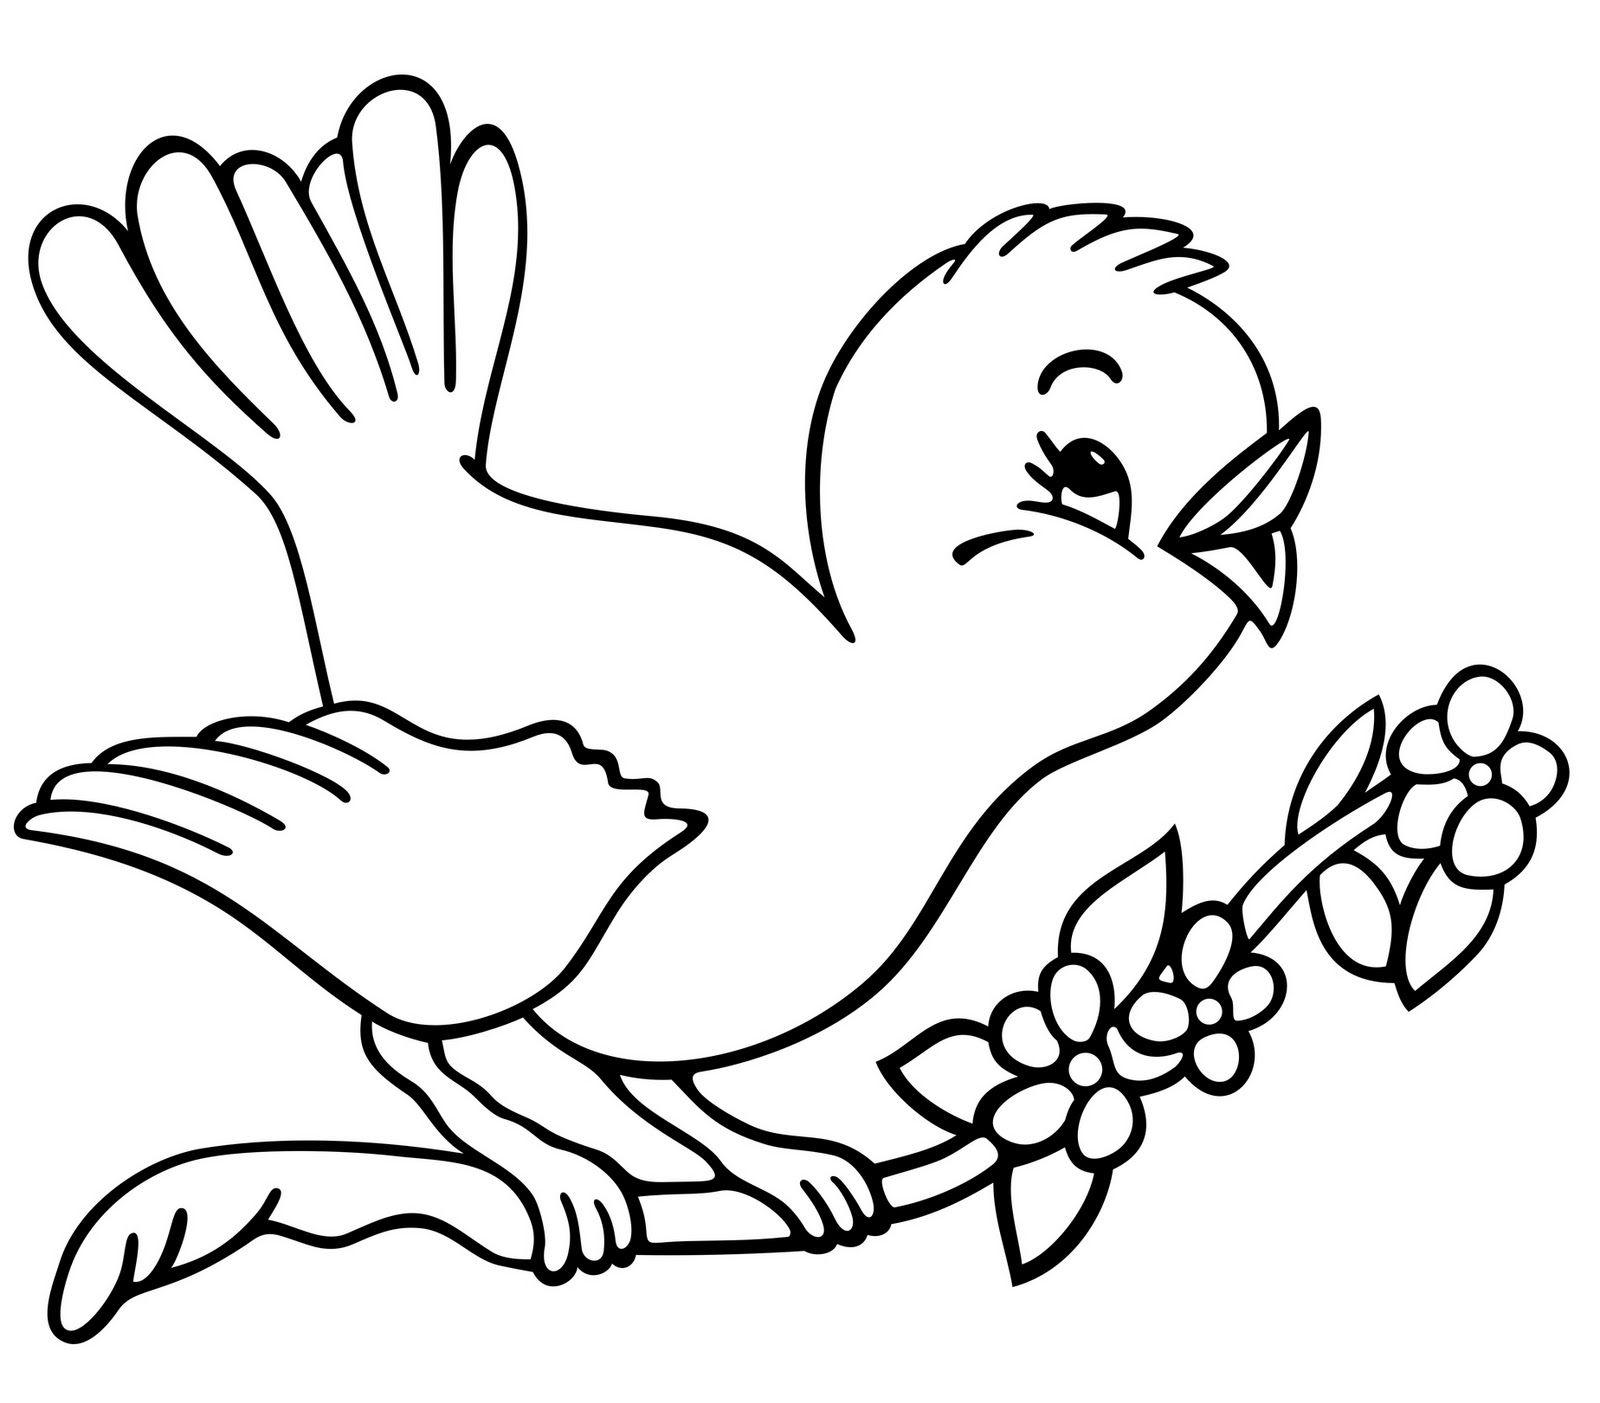 ColoringsAlphabet, Animals, Artwork, Birthdays, Cartoons